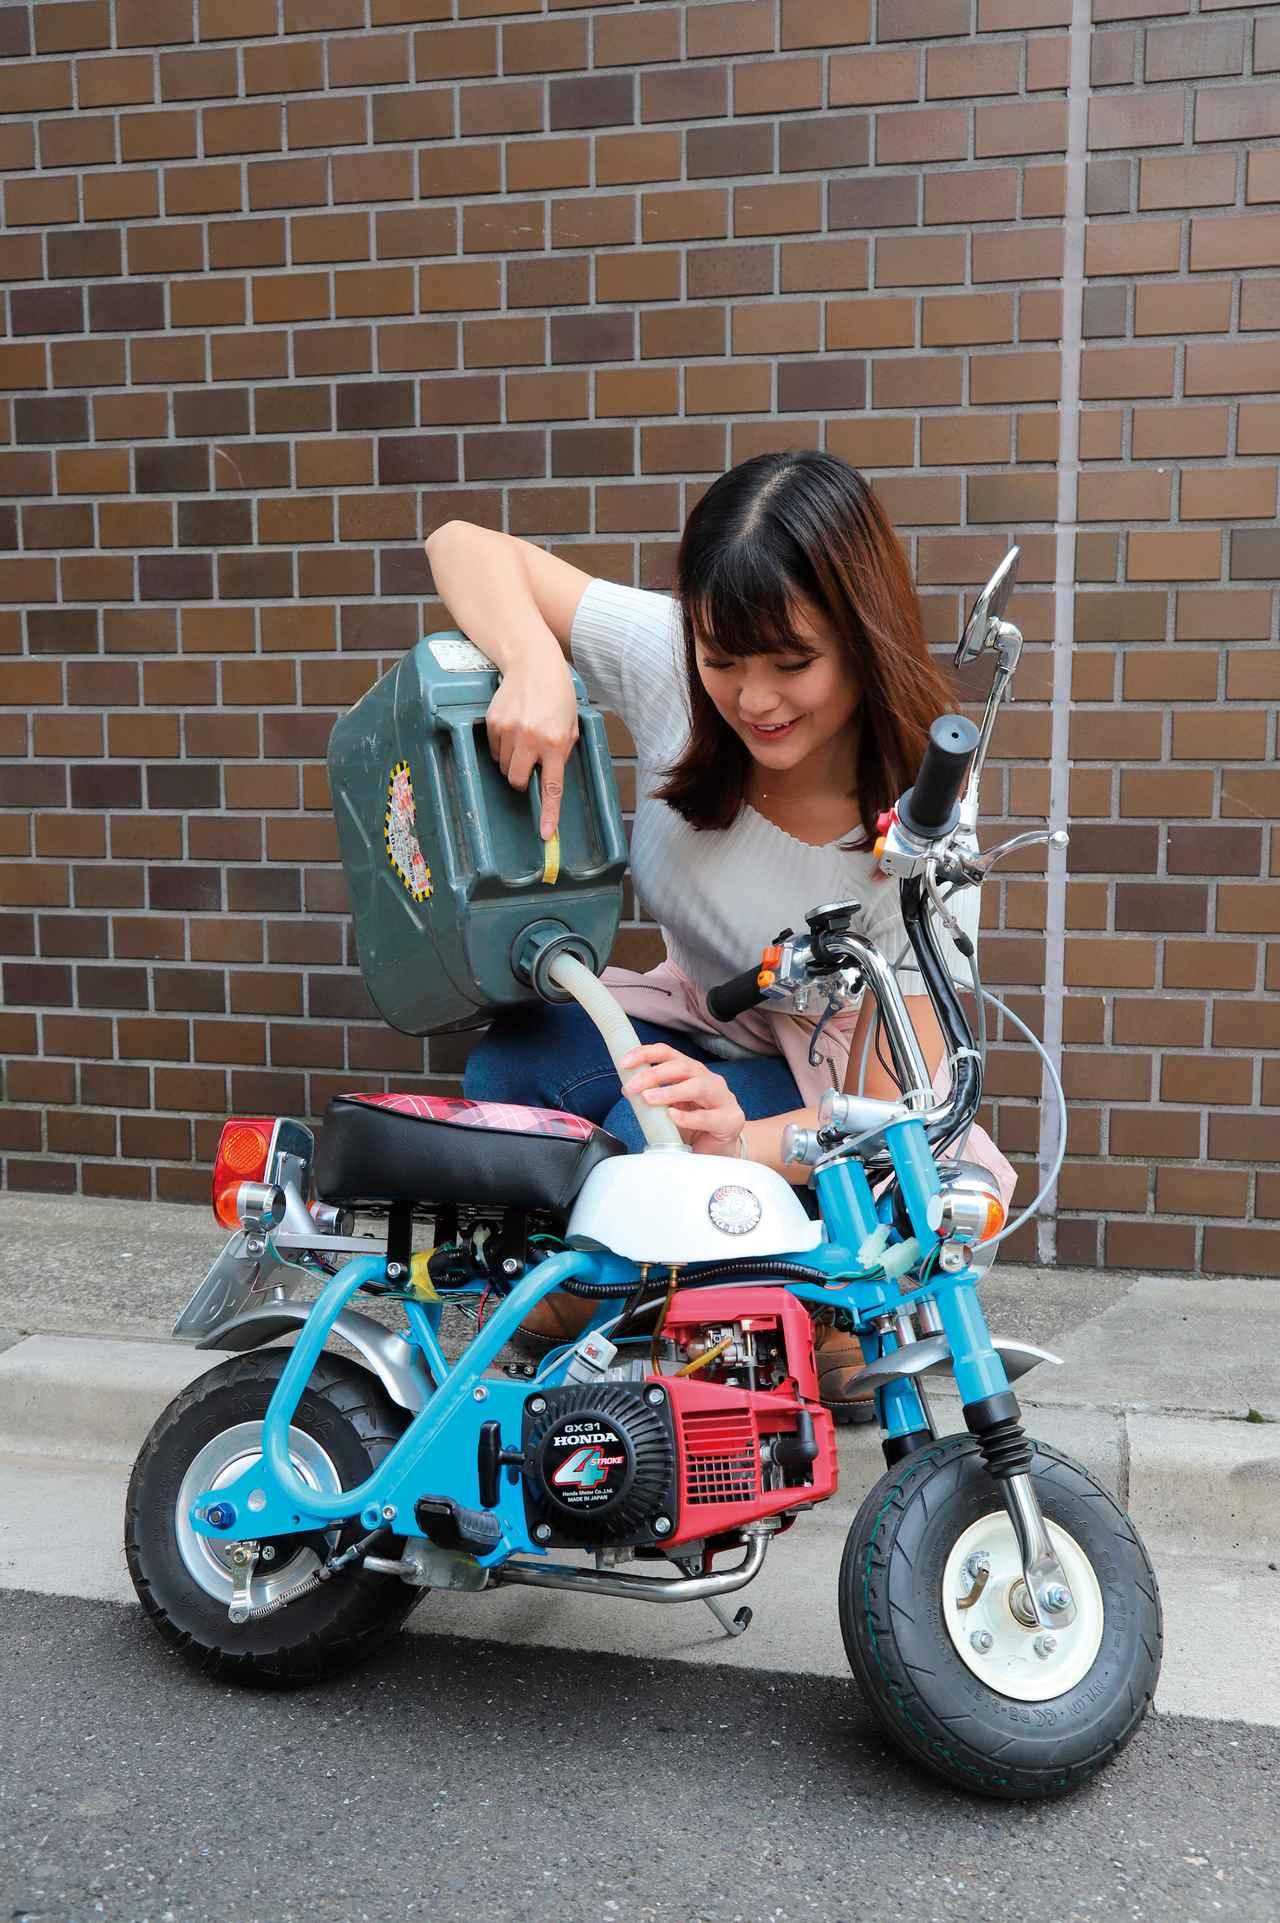 Images : 3番目の画像 - 「世界最小のキットバイク仔猿で走ろう‼ 試乗編「仔猿遊び・その3(全3回)」」のアルバム - webオートバイ